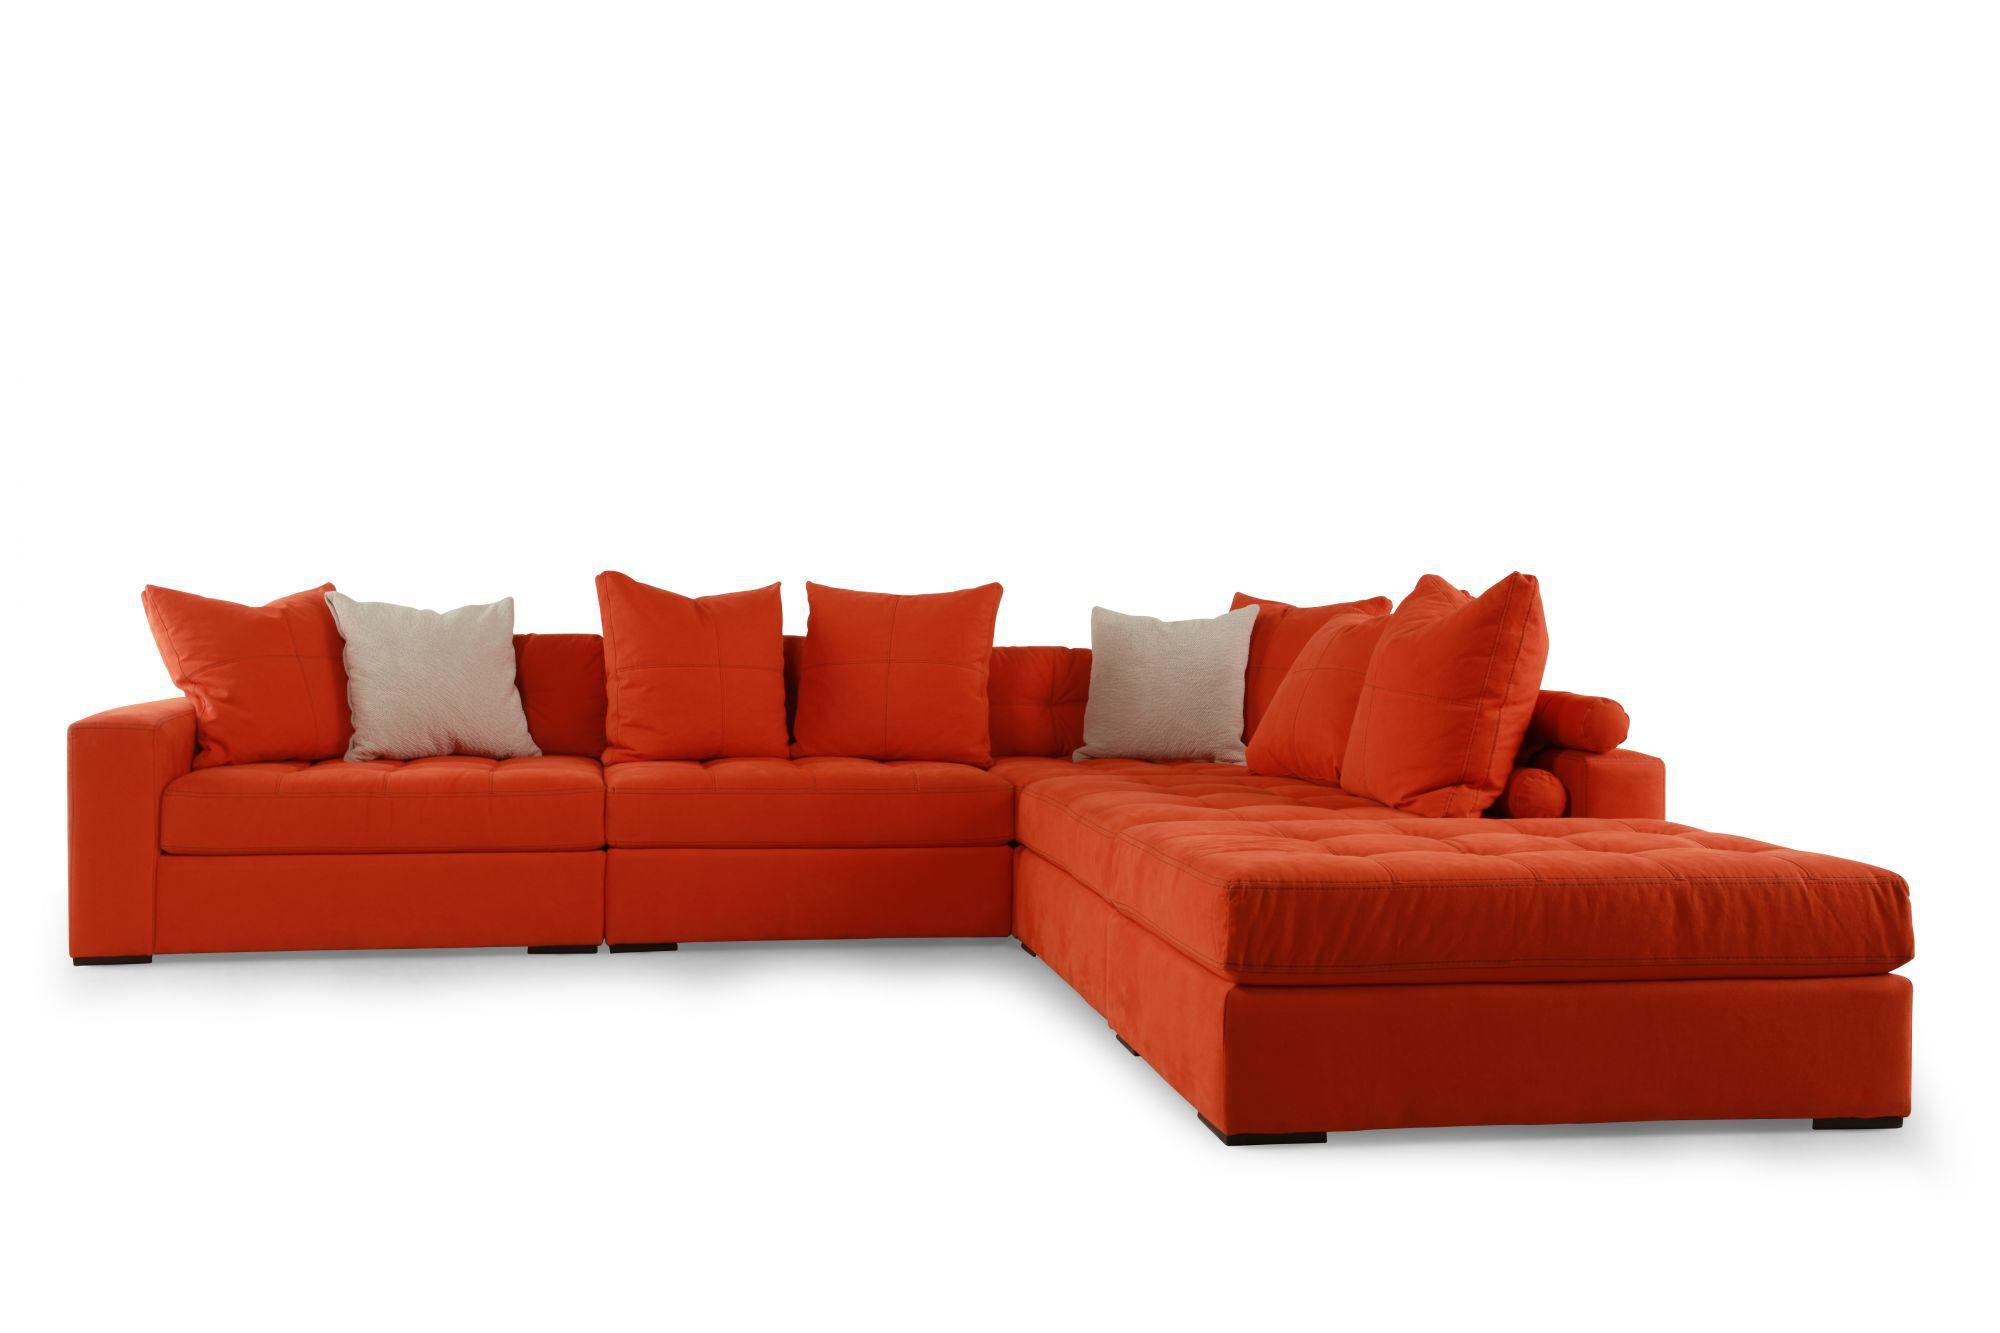 Jonathan Louis Noah Orange Sectional  sc 1 st  Mathis Brothers : jonathan louis furniture sectional - Sectionals, Sofas & Couches